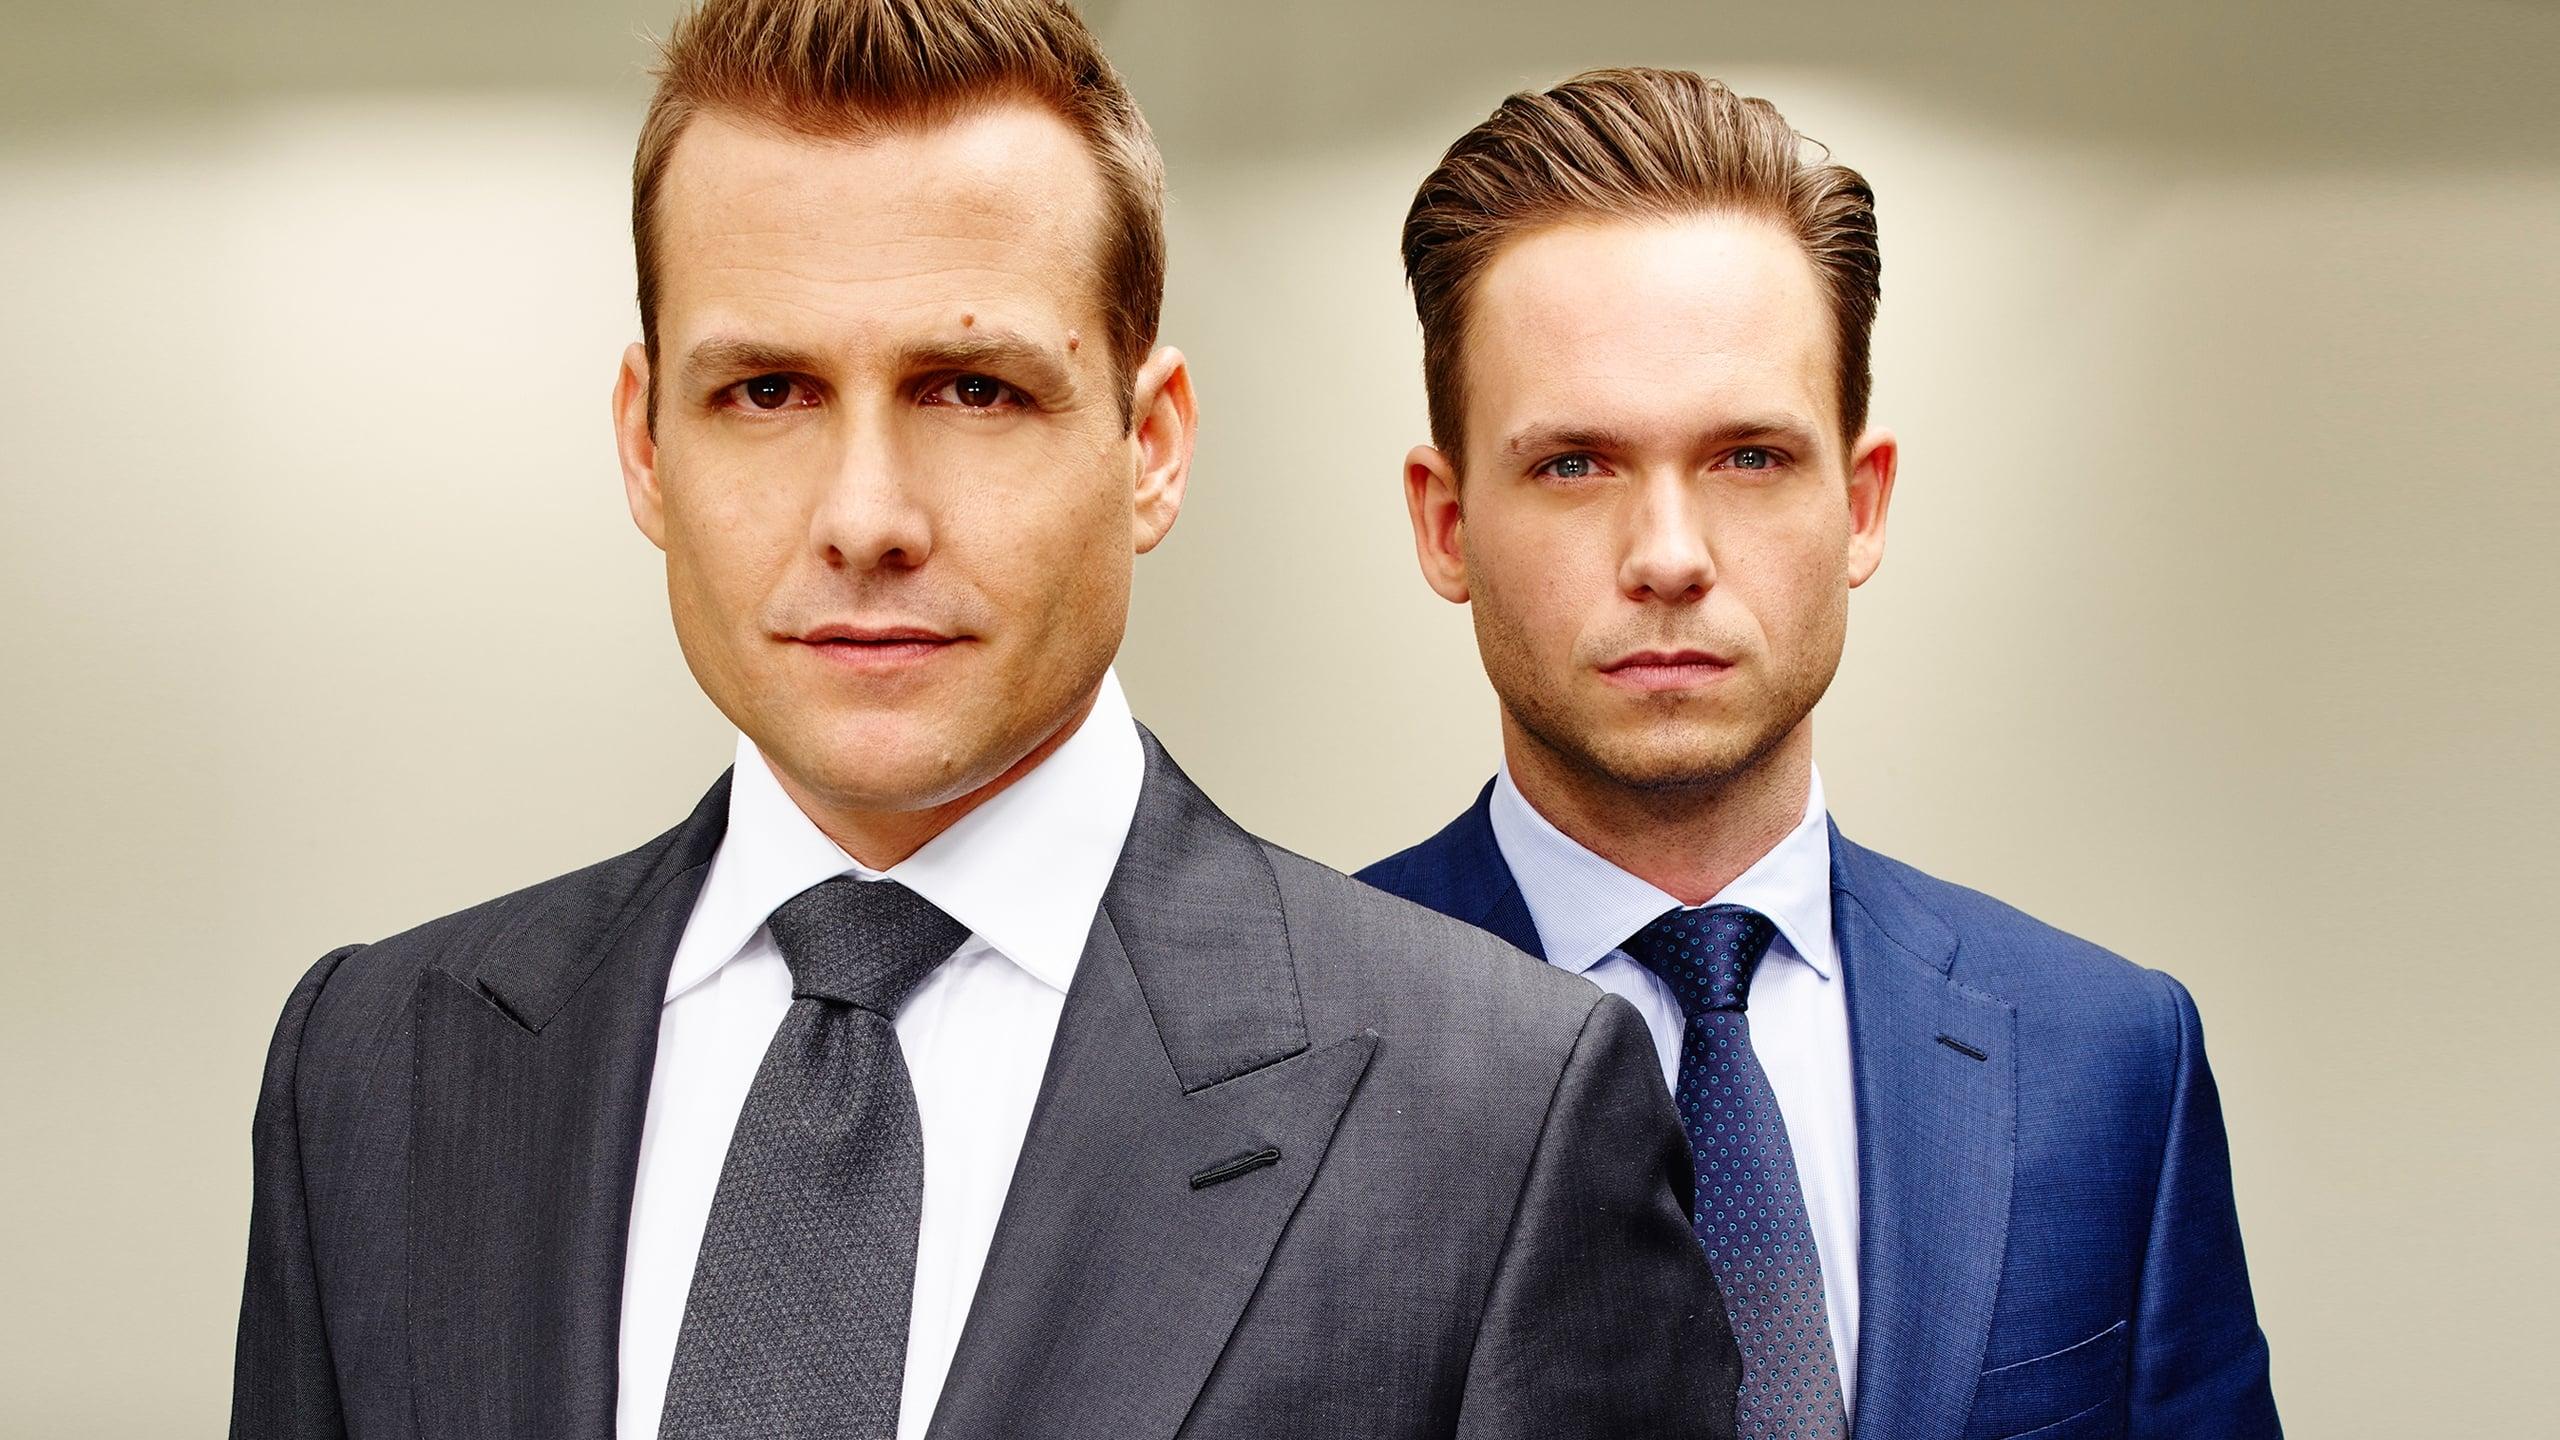 Suits - Season 5